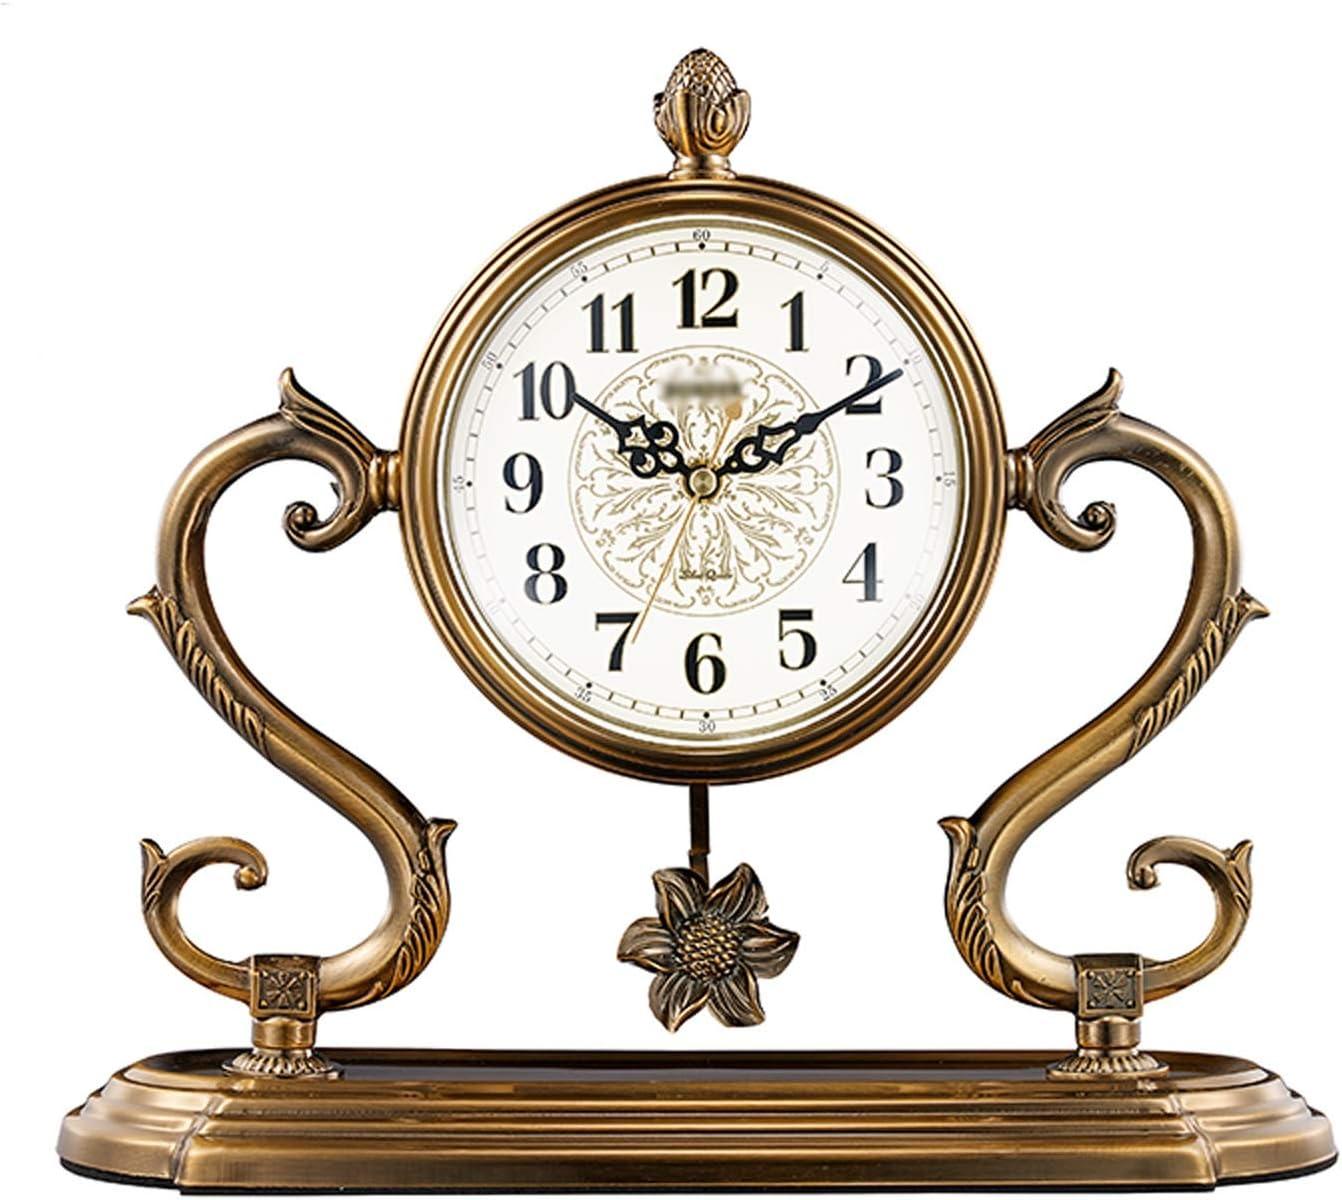 SHUTING2020 Desk Clock Time sale Household Cloc Metal Desktop Single-Sided Popular brand in the world